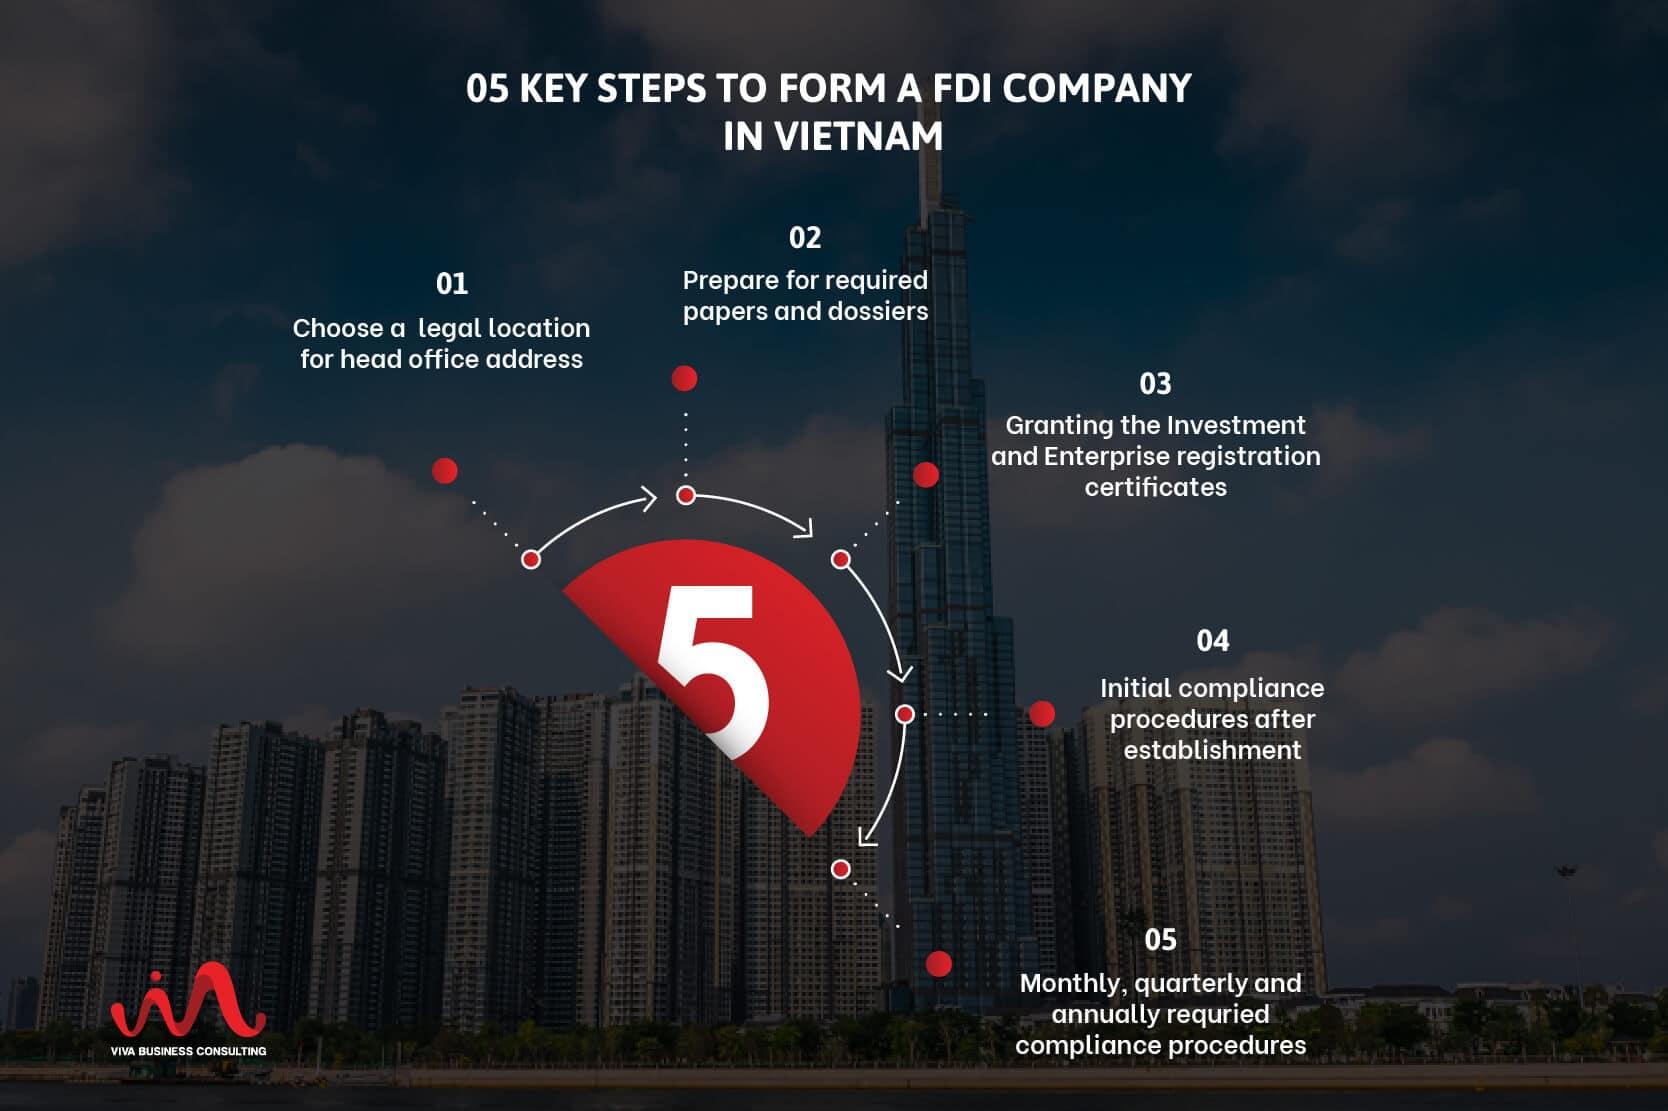 set up FDI company in Vietnam